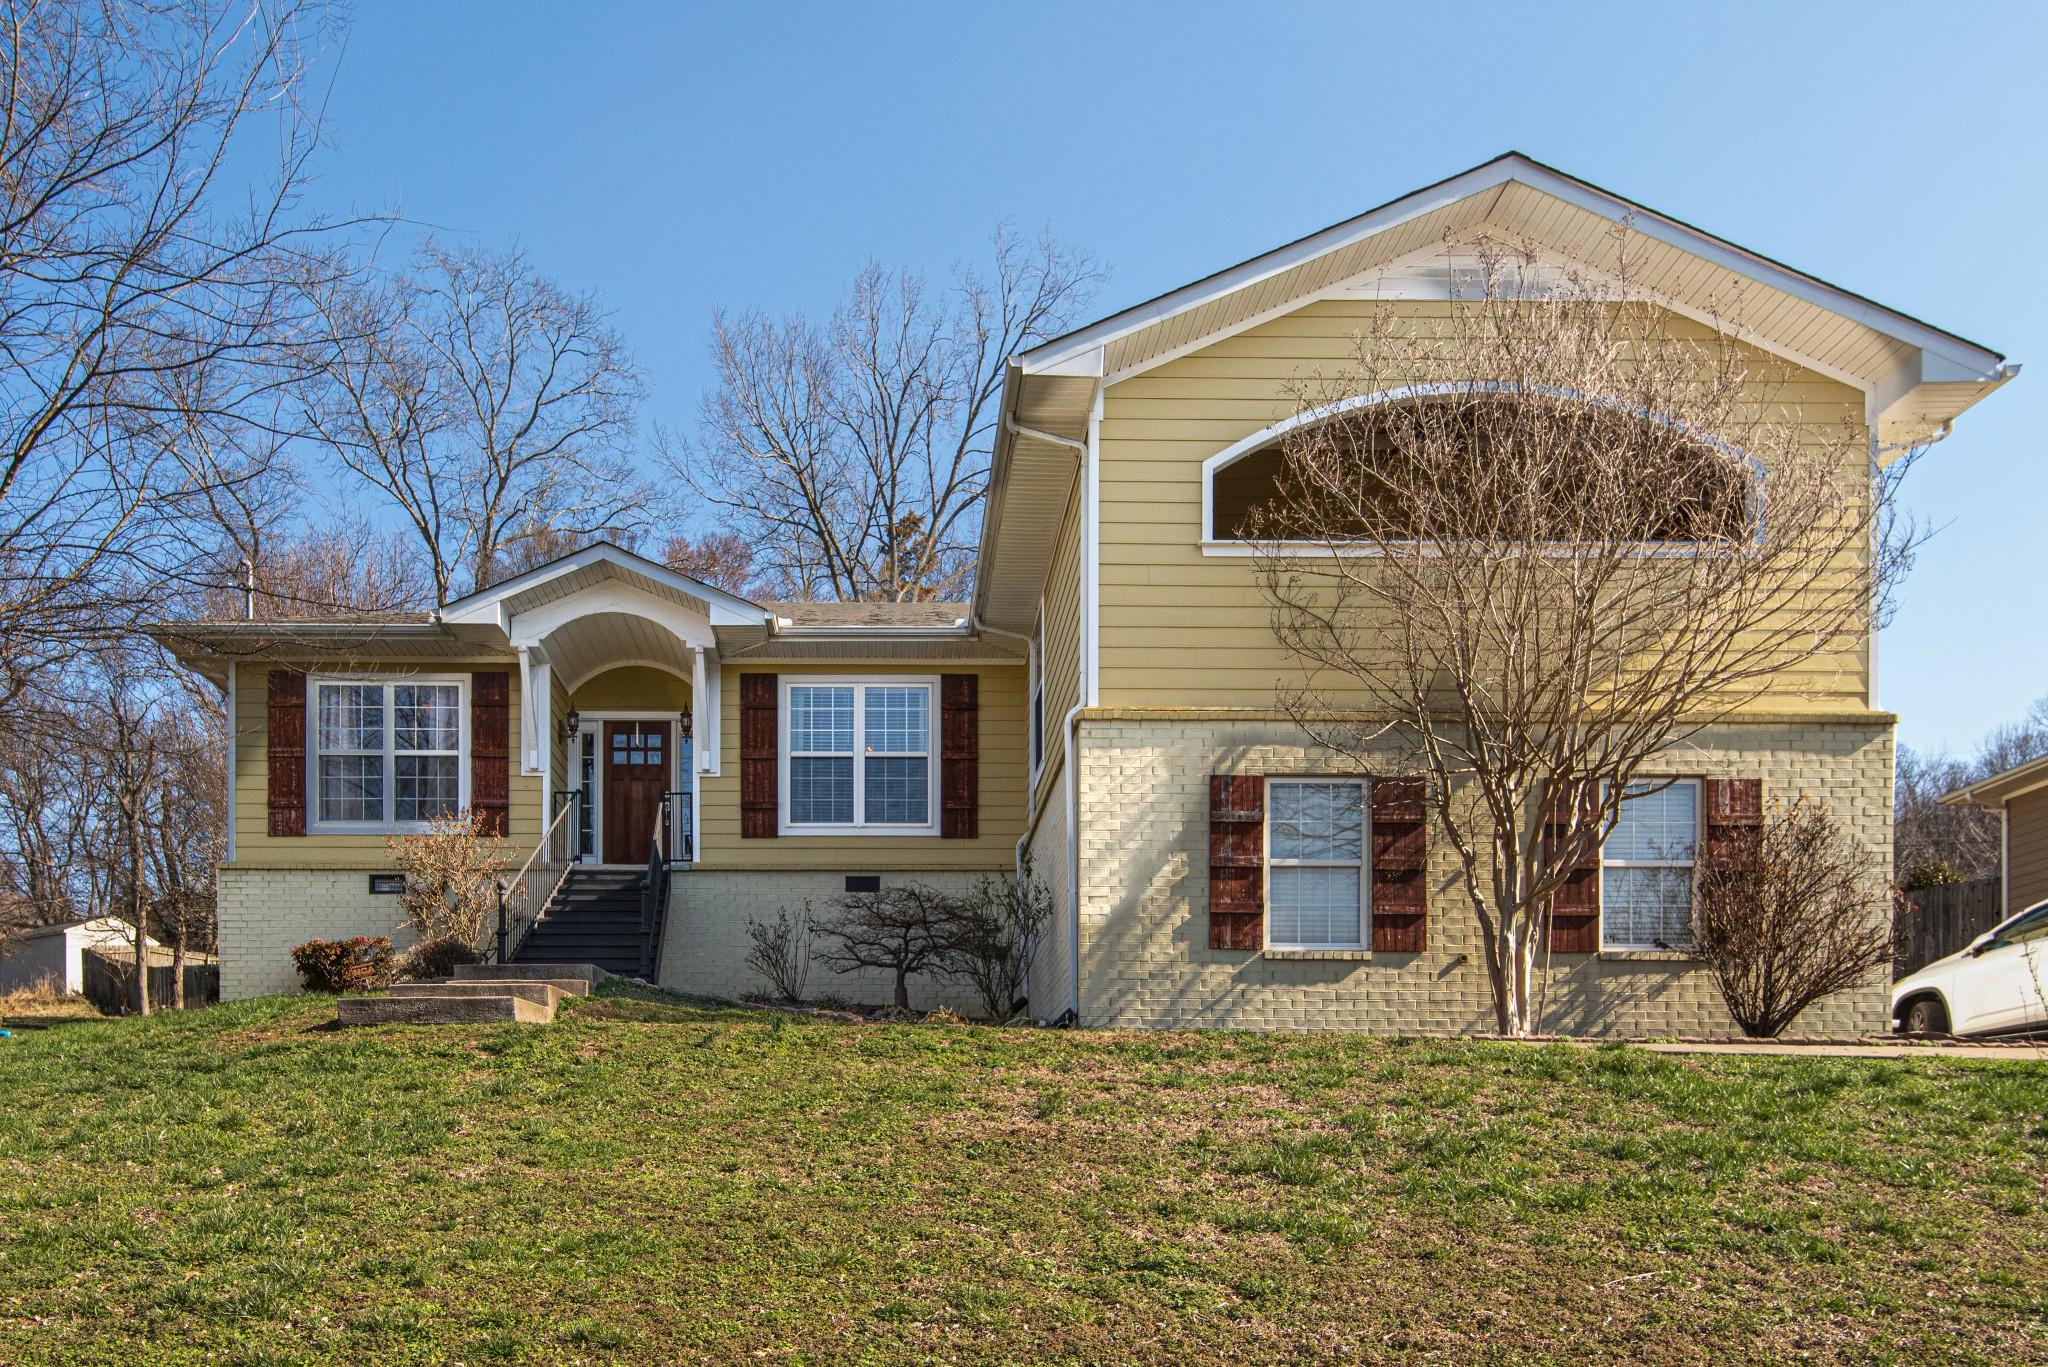 439 Williamsport Dr, Smyrna, TN 37167 - Smyrna, TN real estate listing